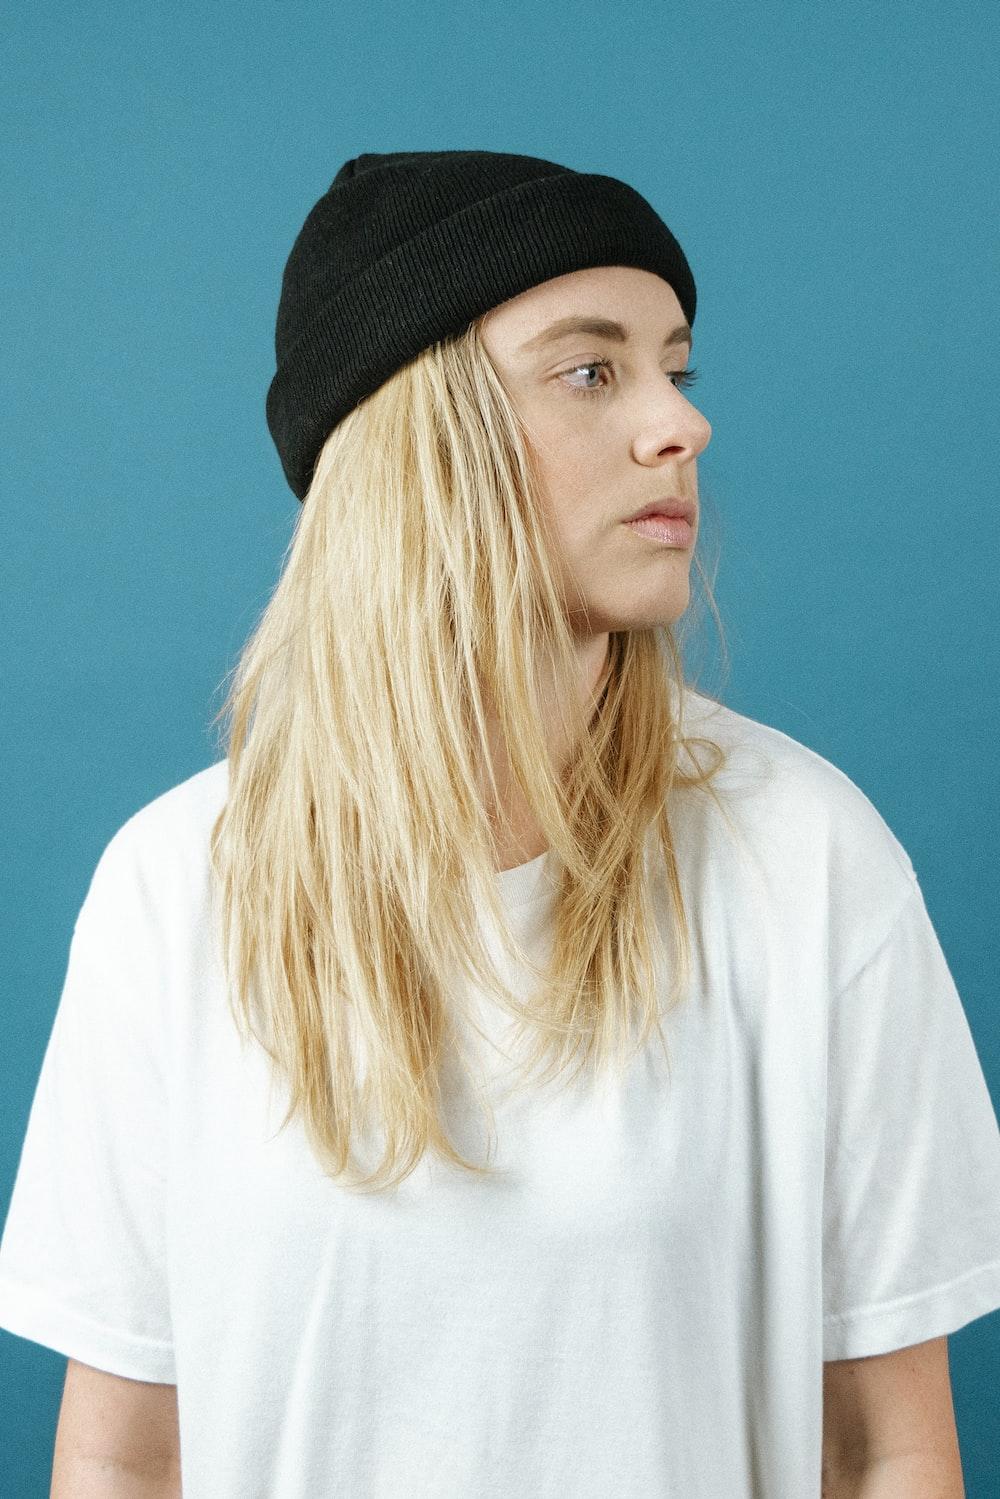 woman in white shirt wearing black knit cap